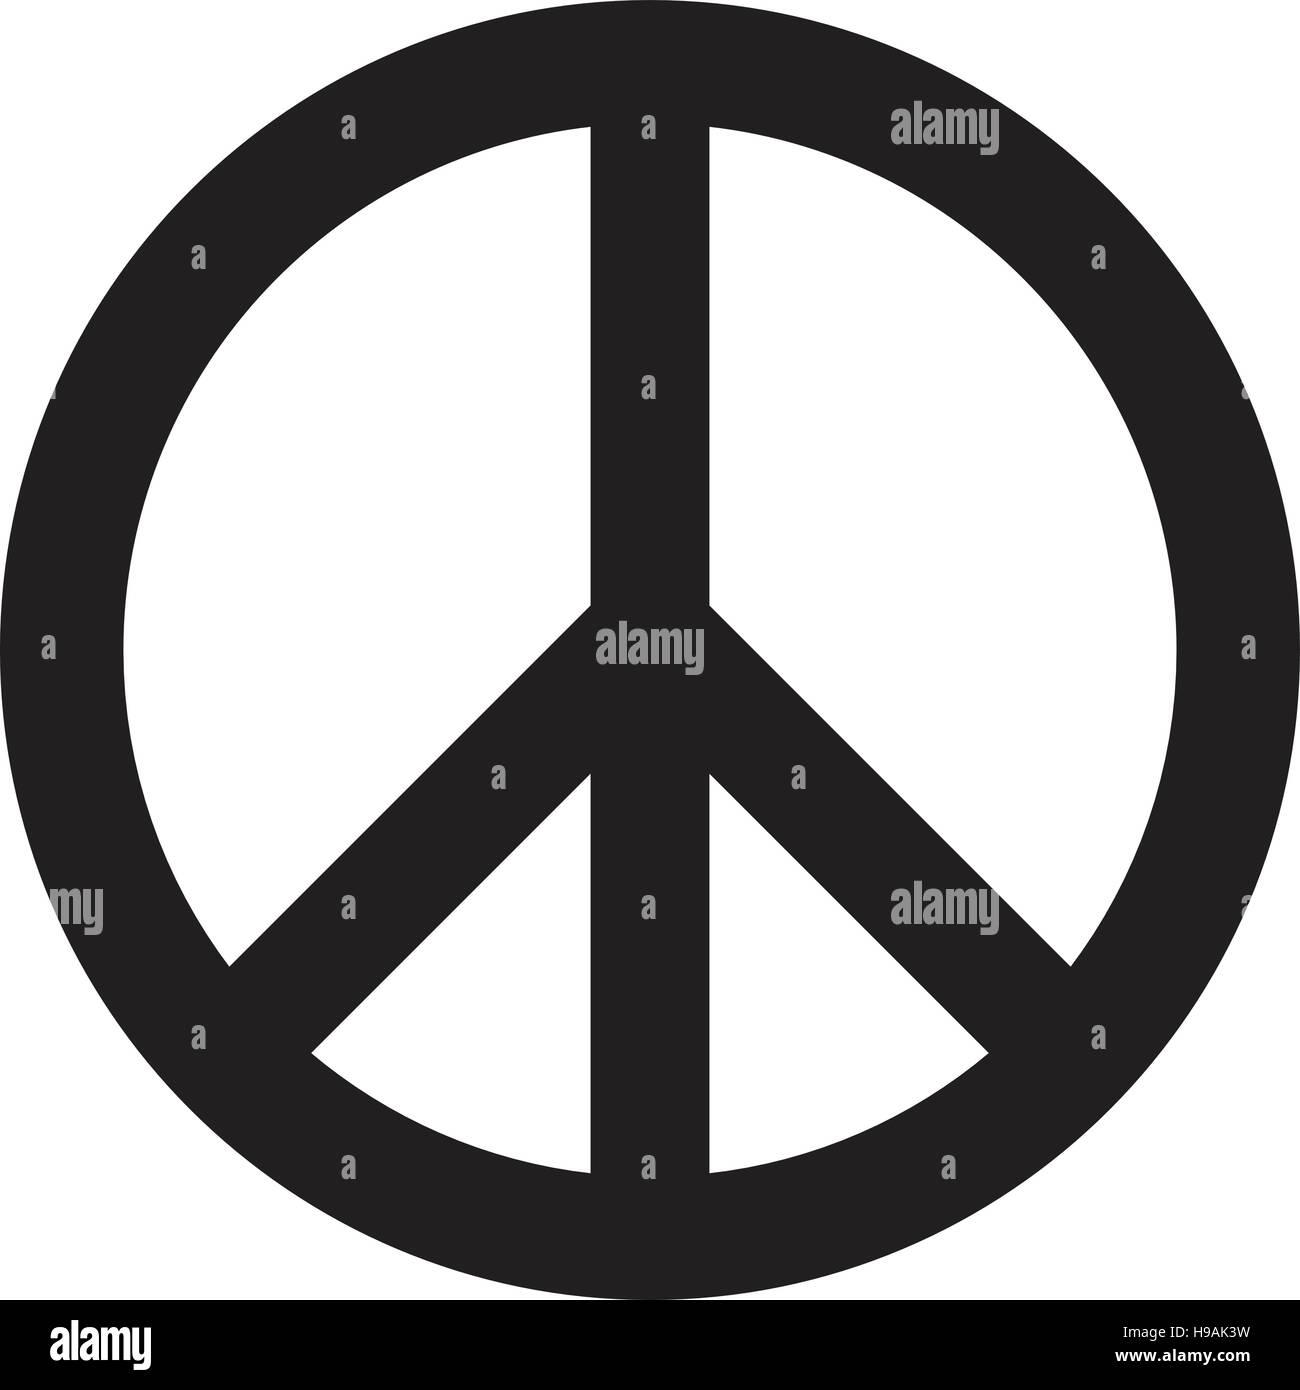 Symbole de la paix Photo Stock